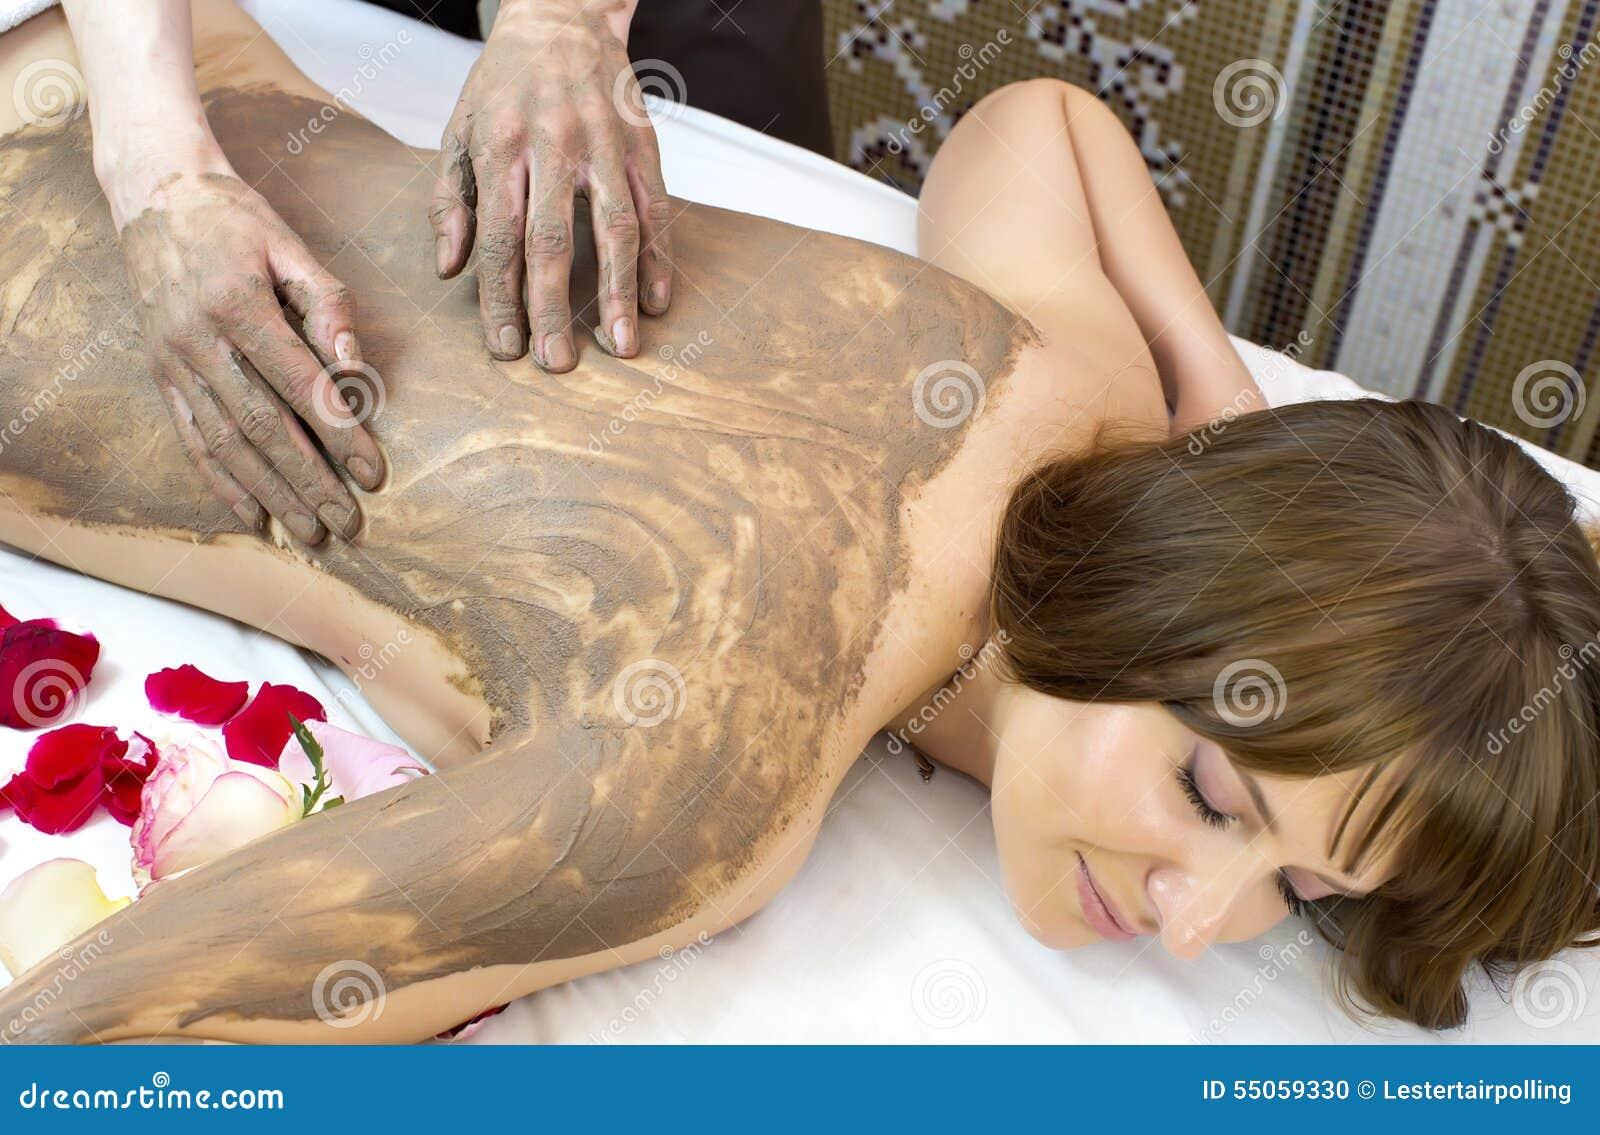 gratis massage sex escort massage com